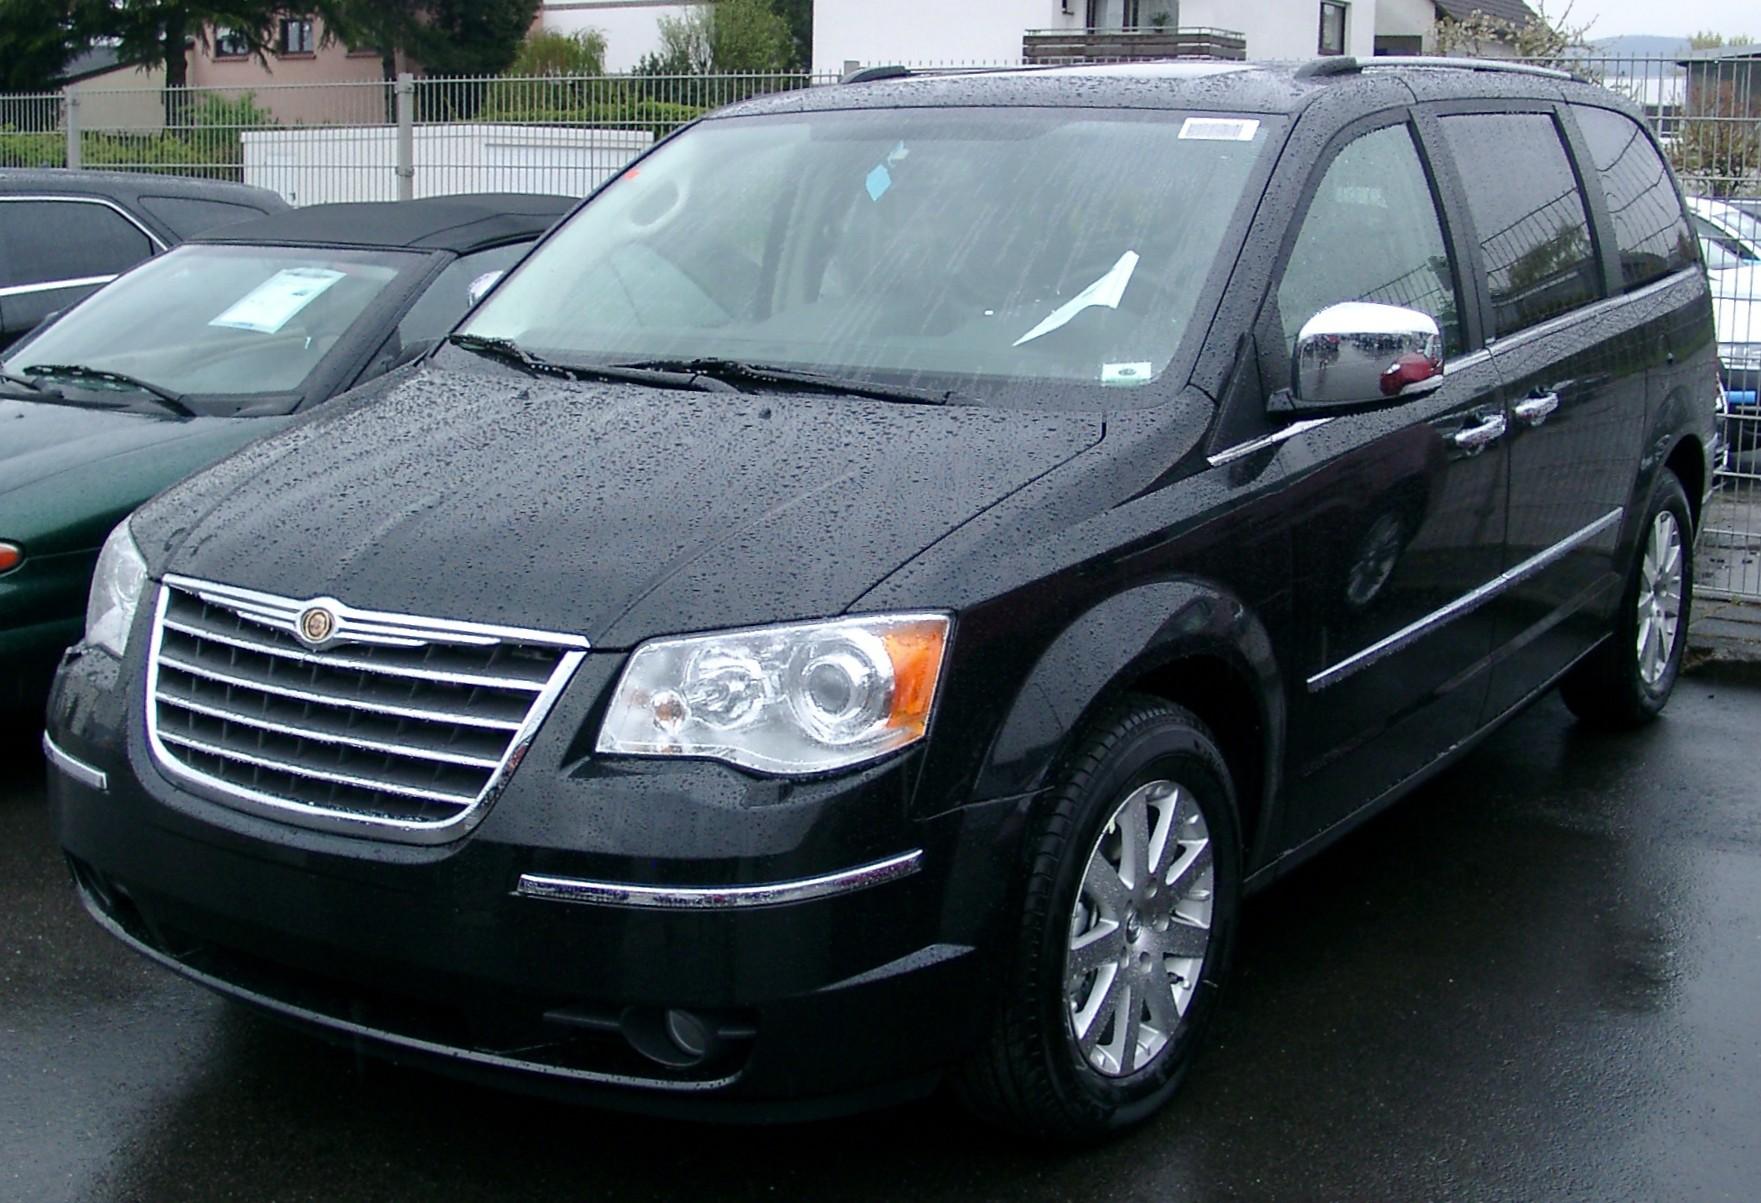 Chrysler Voyager 2008 Photo - 1